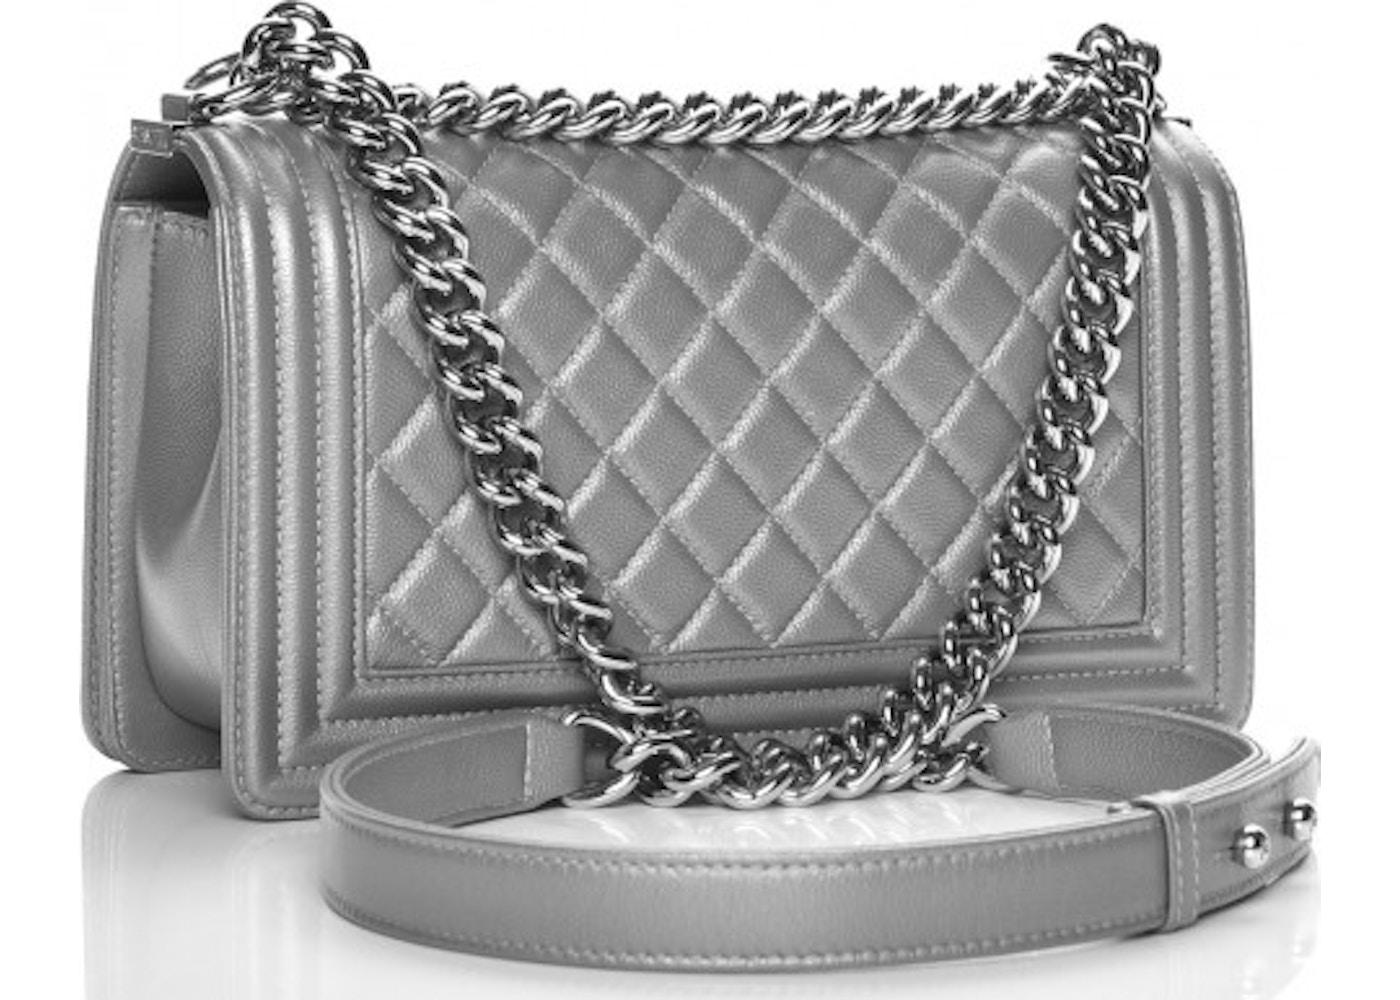 0924df6512b4 Chanel Boy Flap Diamond Quilted Metallic Medium Silver